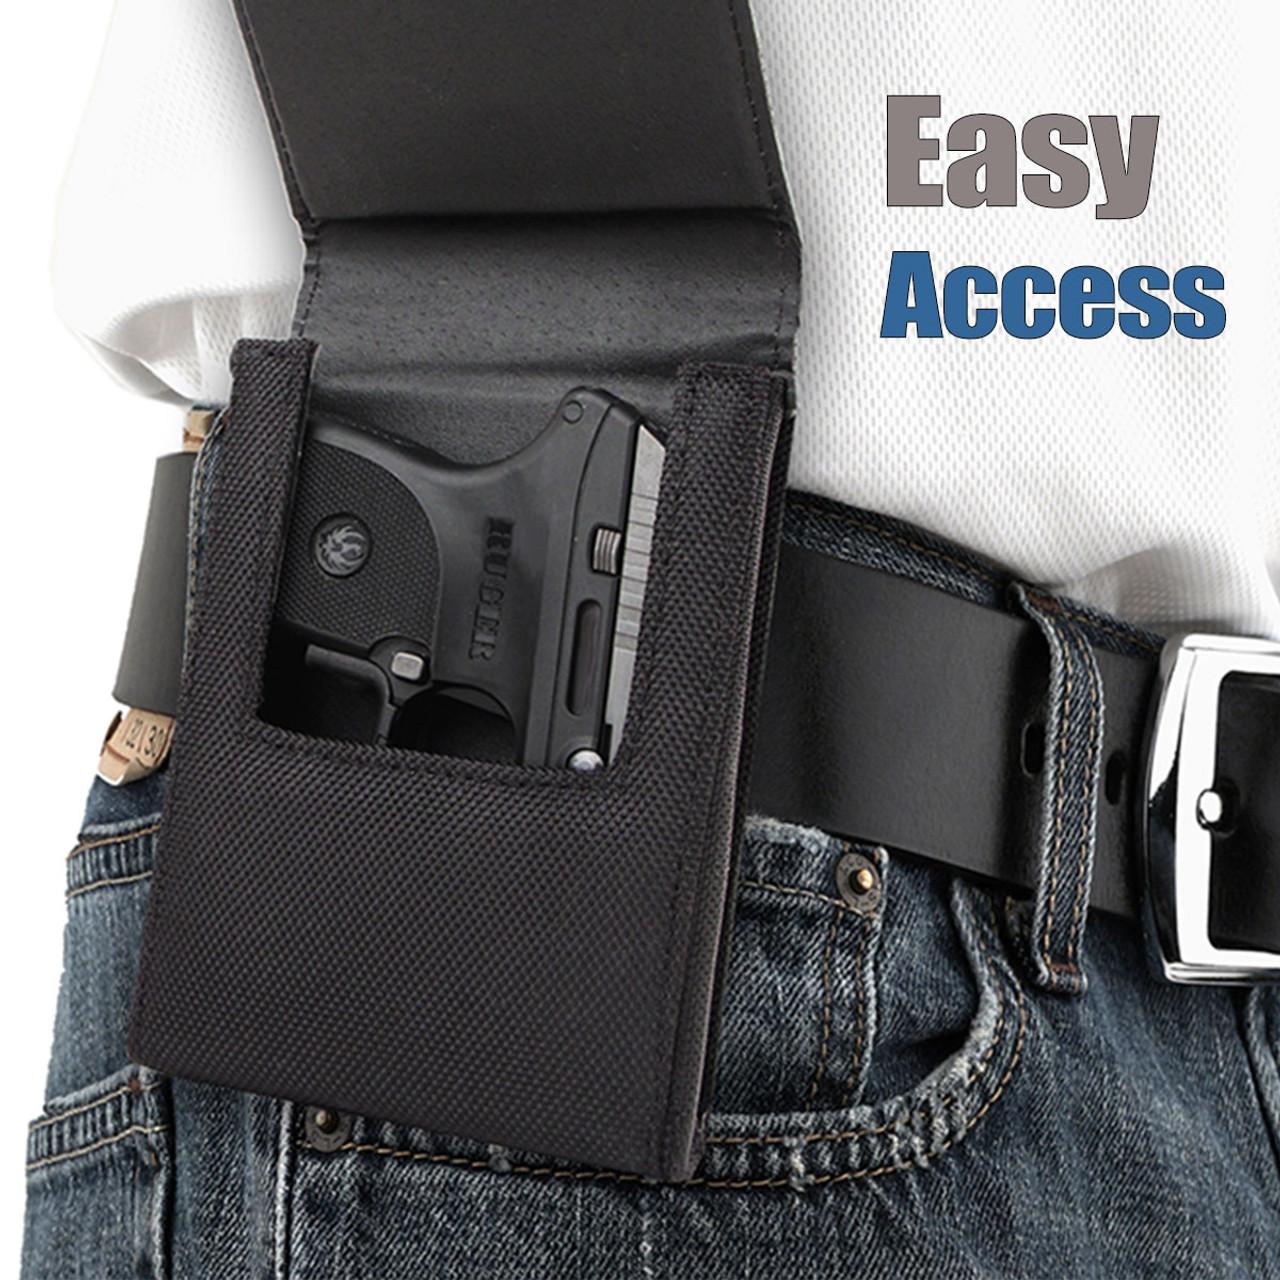 Colt Mustang Pocketlite Sneaky Pete Holster (Belt Clip)